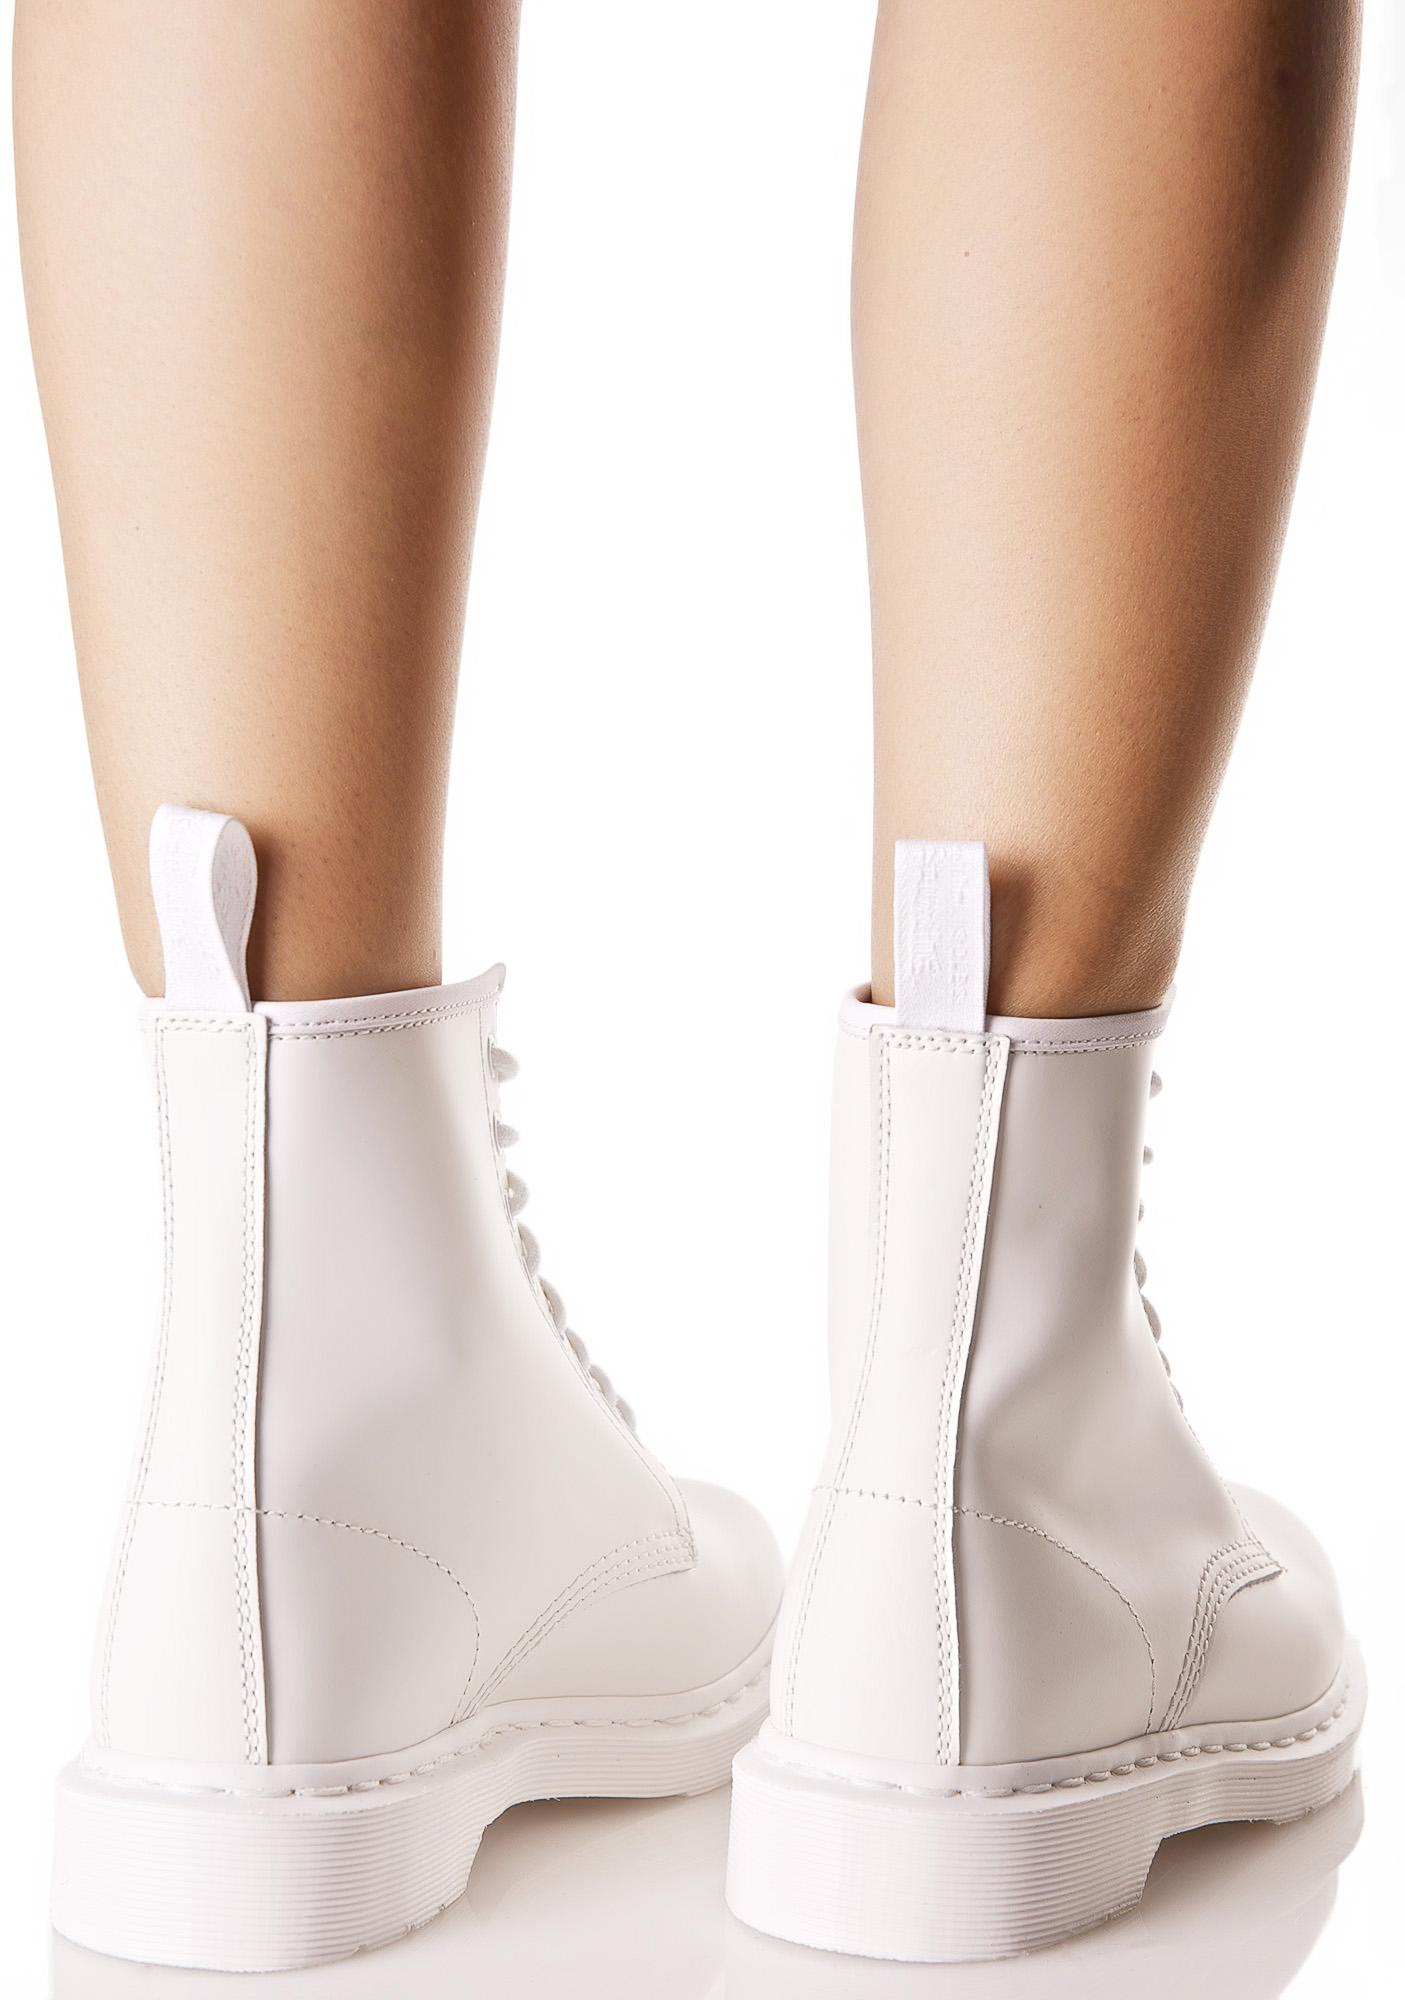 Dr. Martens Mono 1460 8 Eye Boots